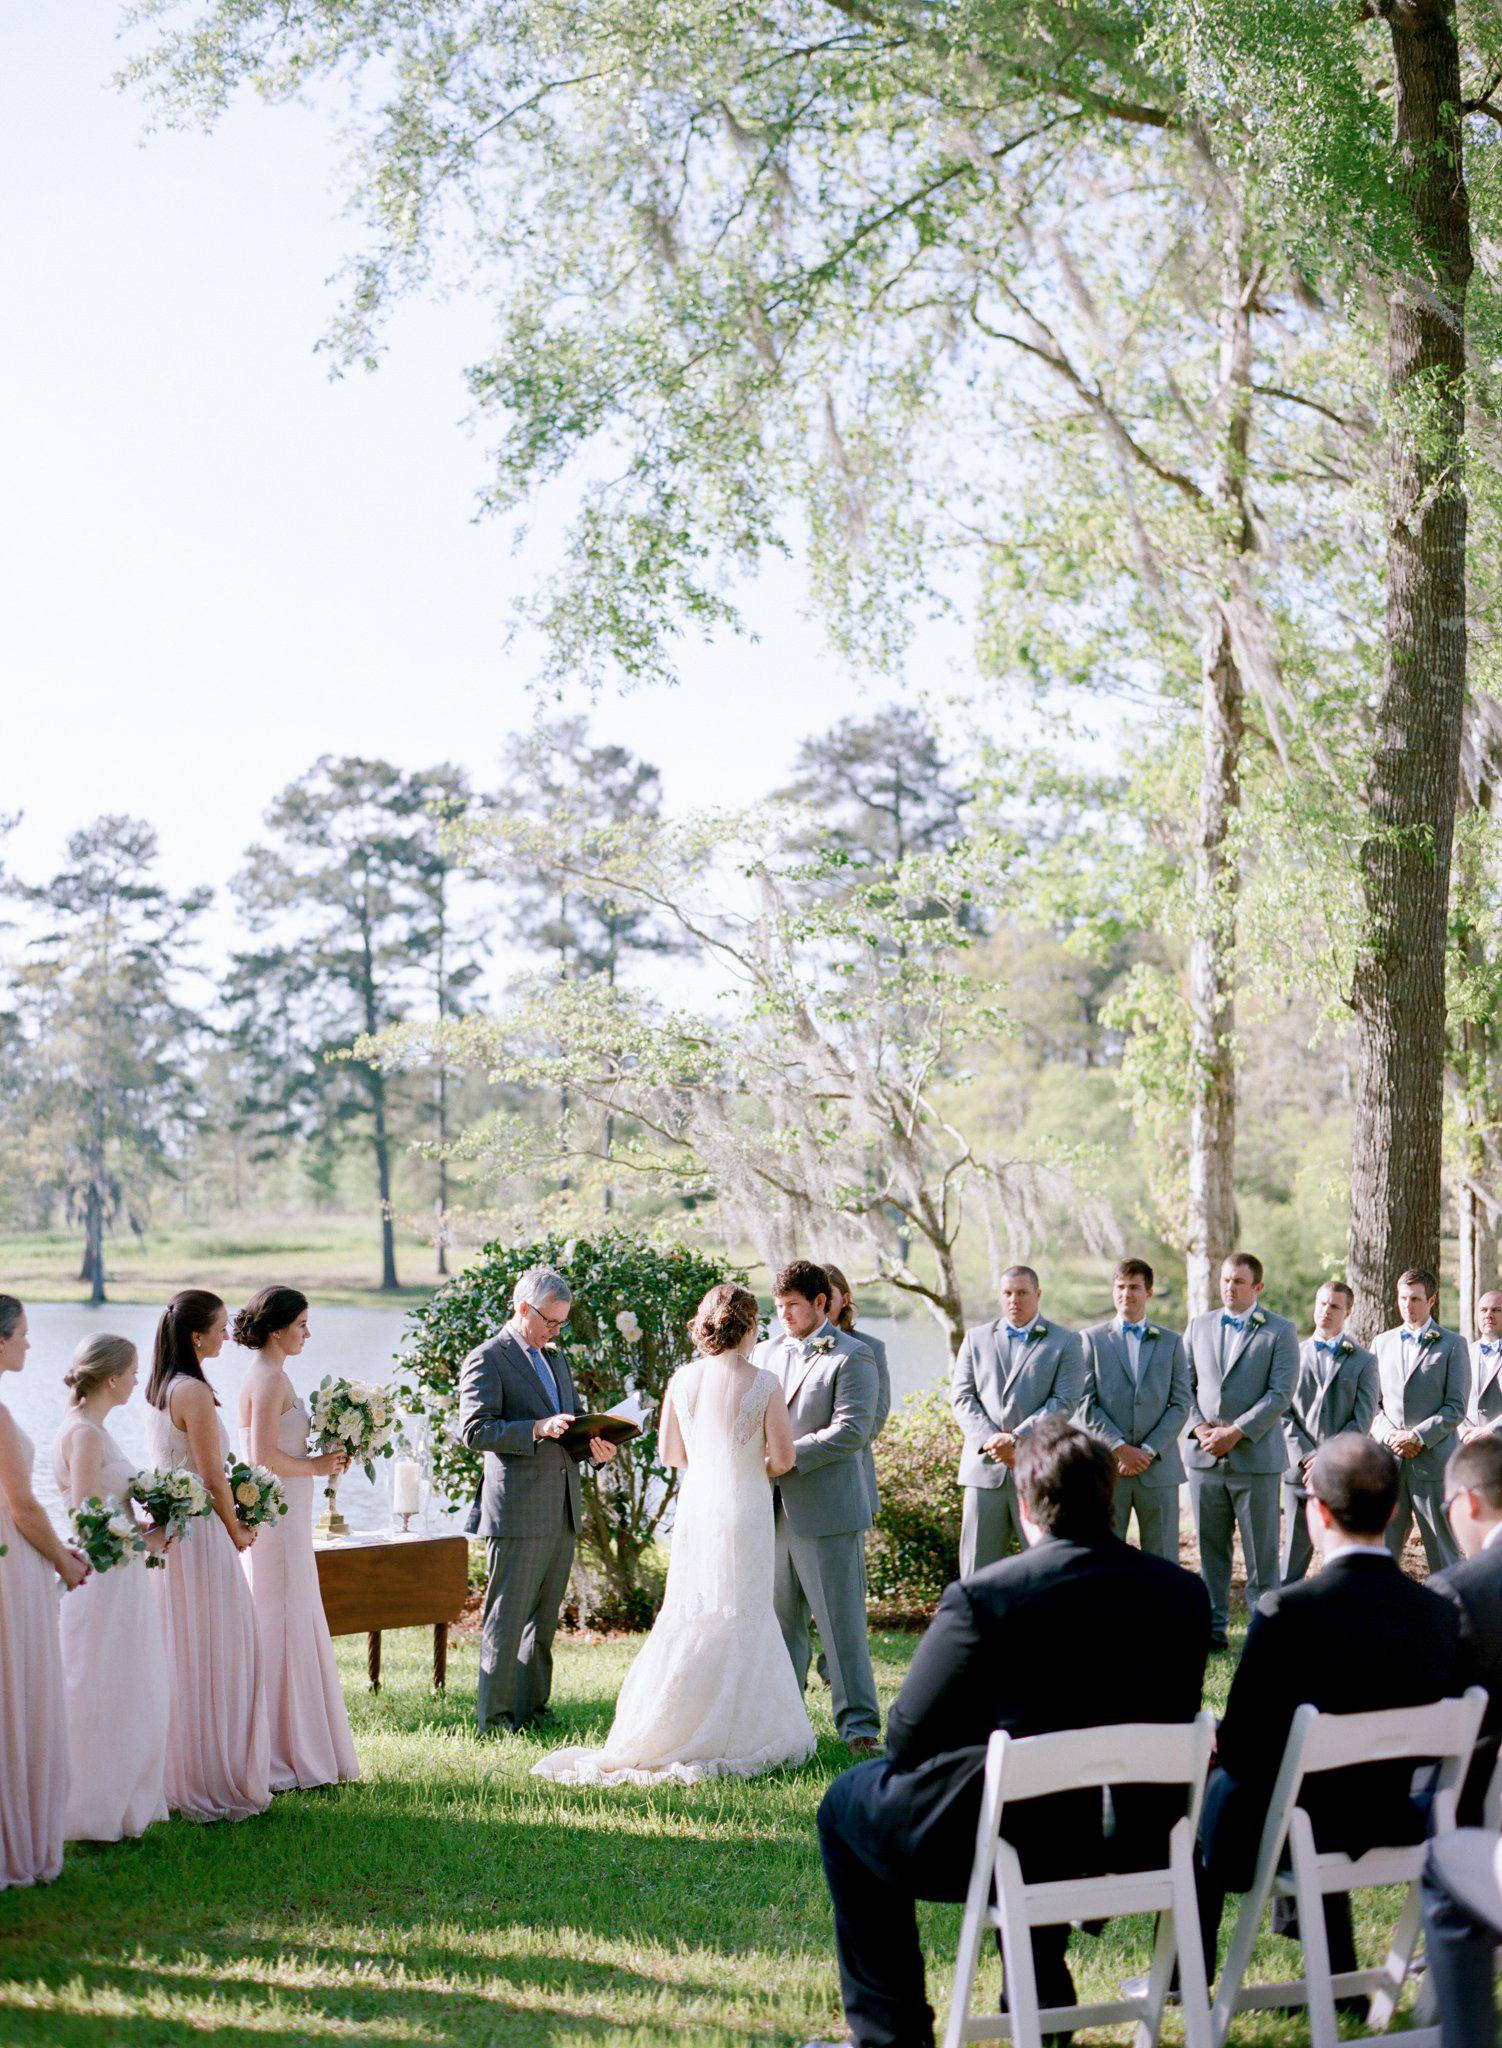 ecila farm wedding albany georgia wedding photographer shannon griffin photography-74.jpg